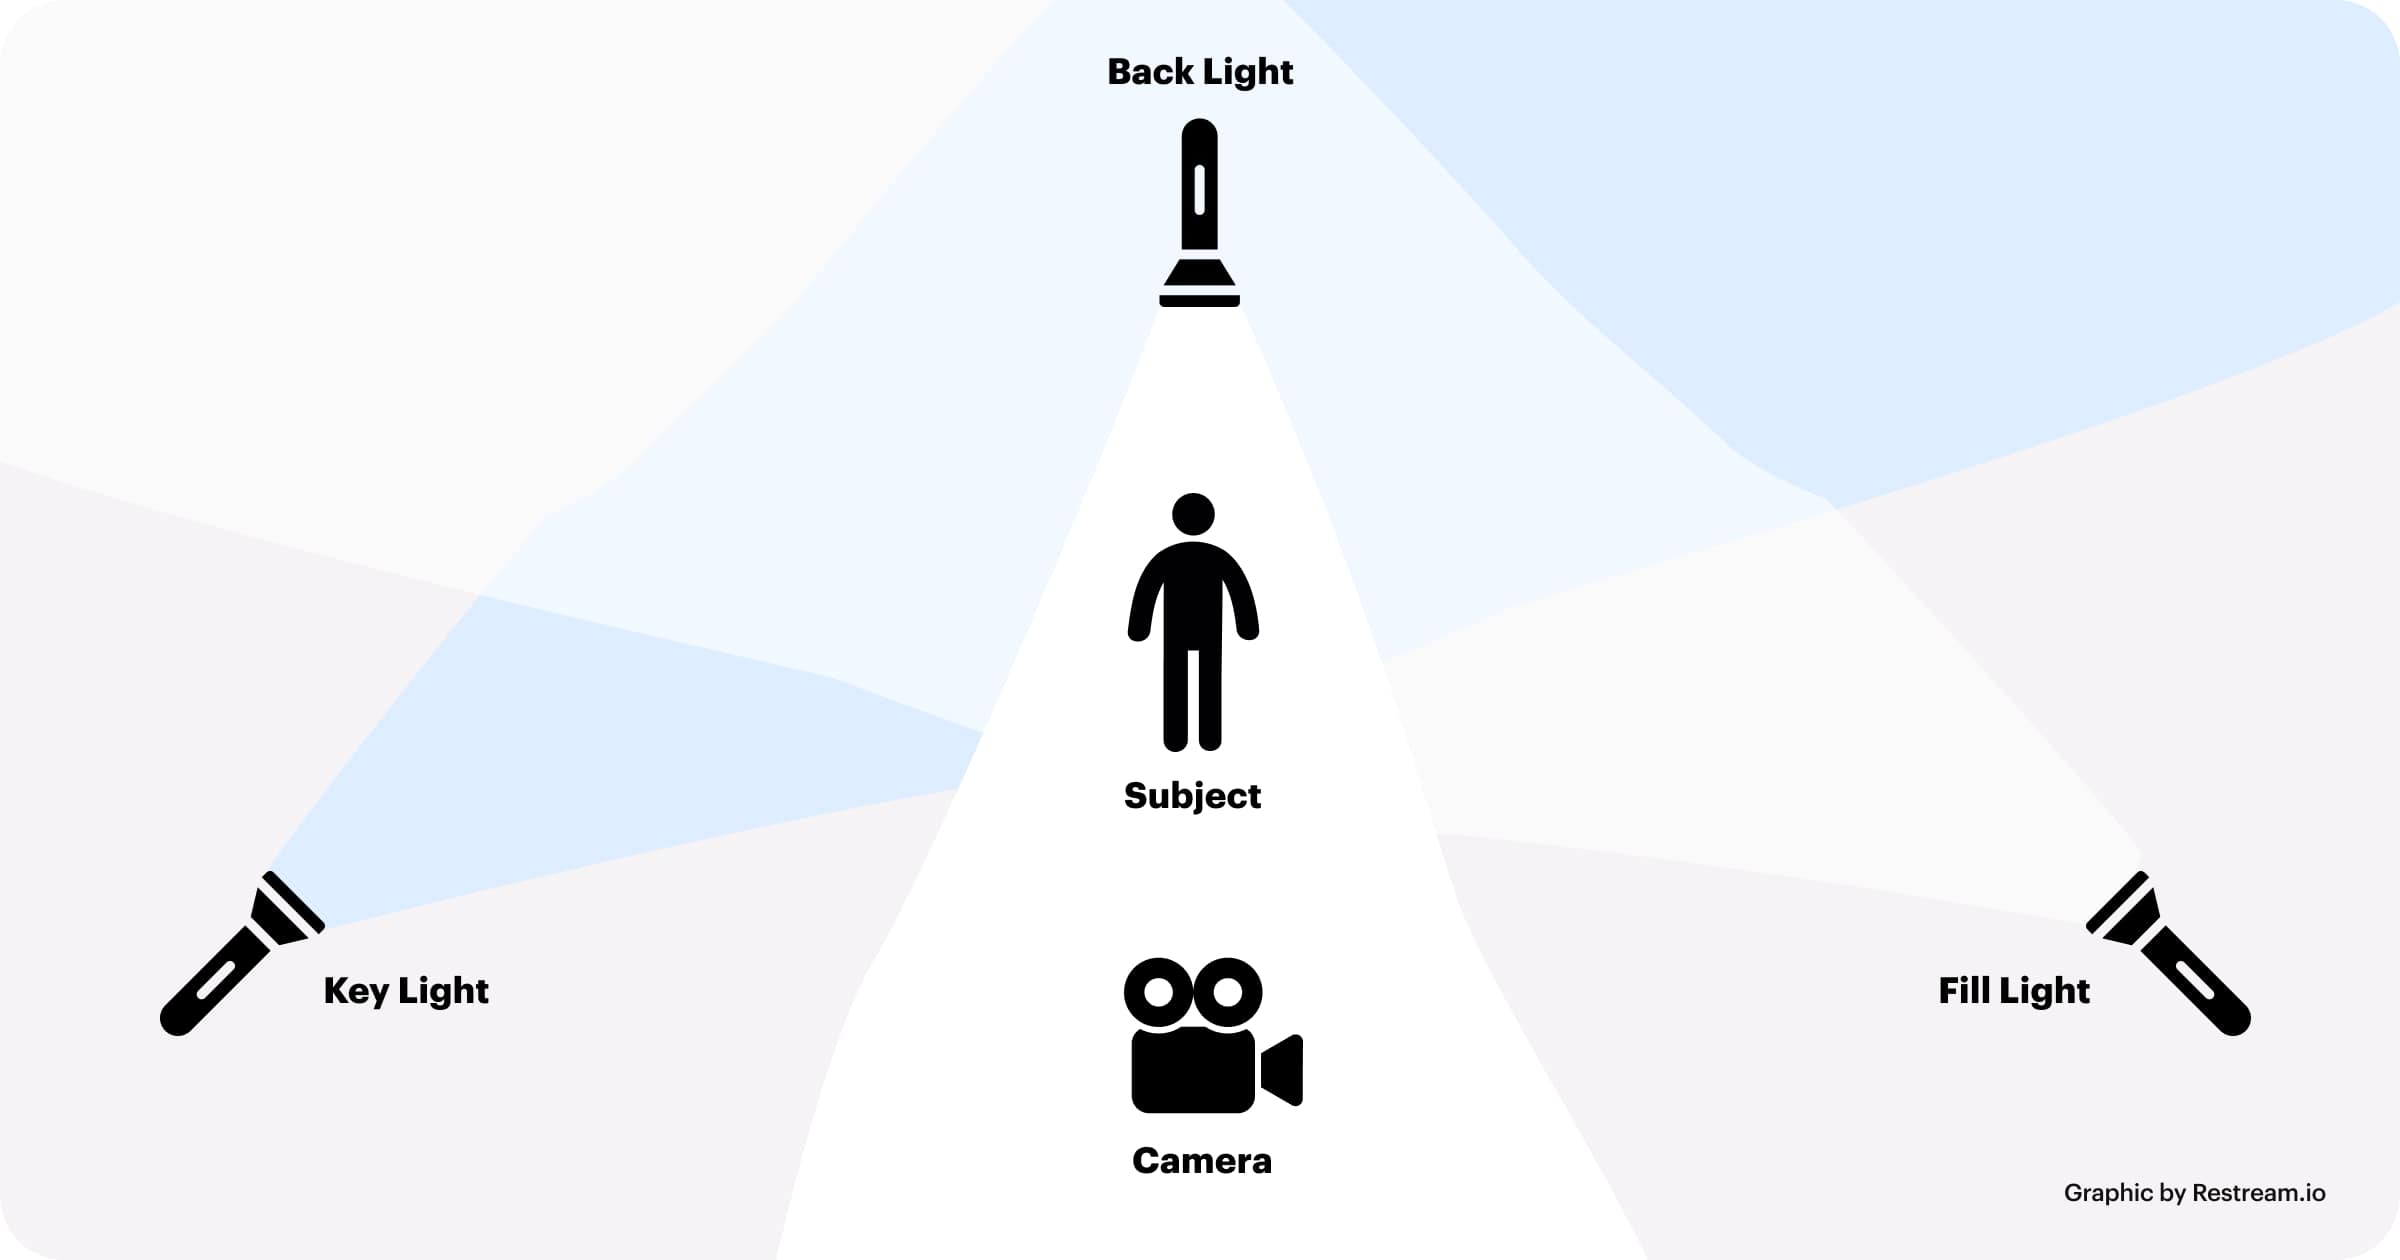 Scheme of installing additional lighting